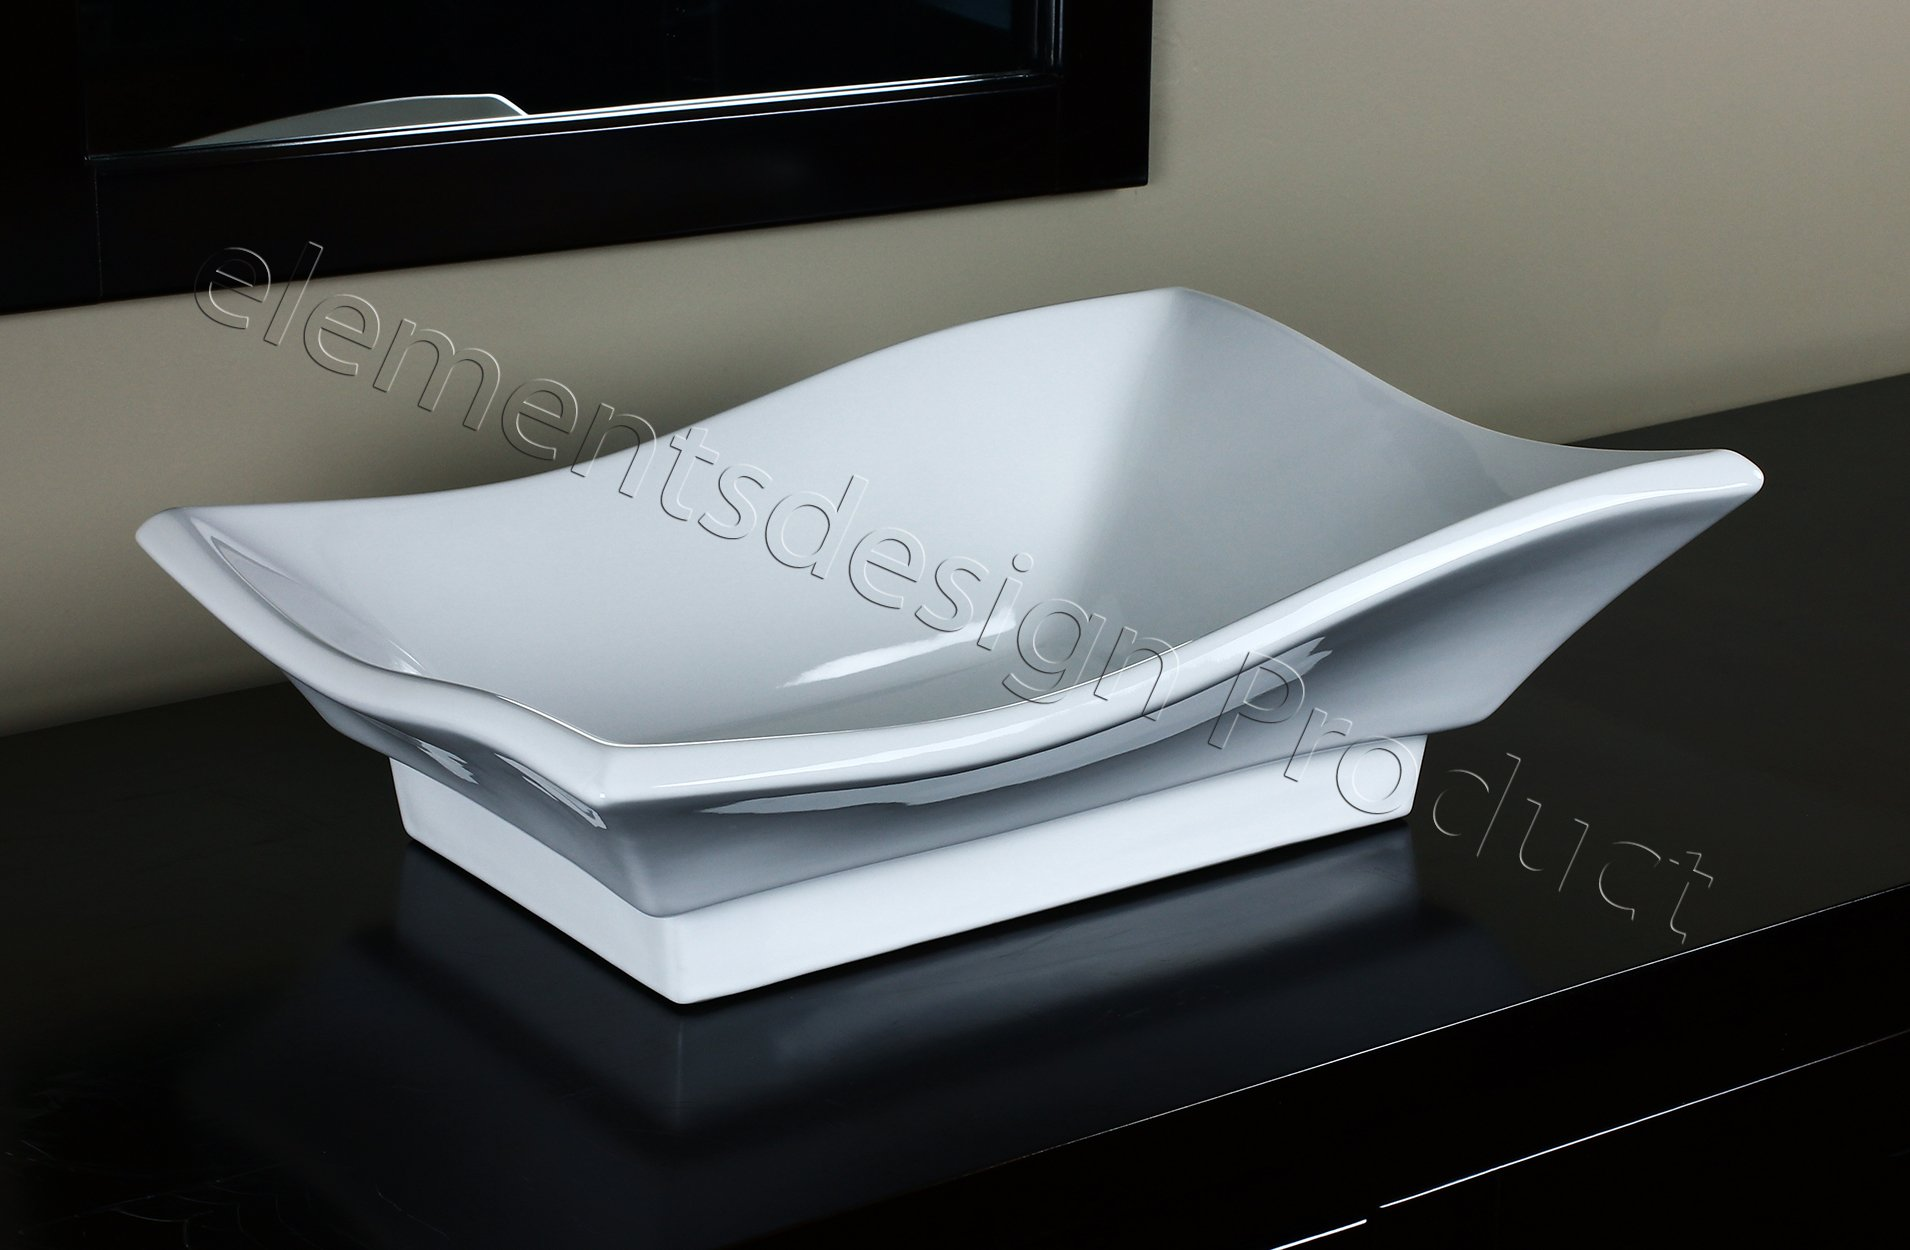 Bathroom White Ceramic Porcelain Vessel Vanity Sink 7459 + *FREE Pop Up Drain* by ELIMAX'S